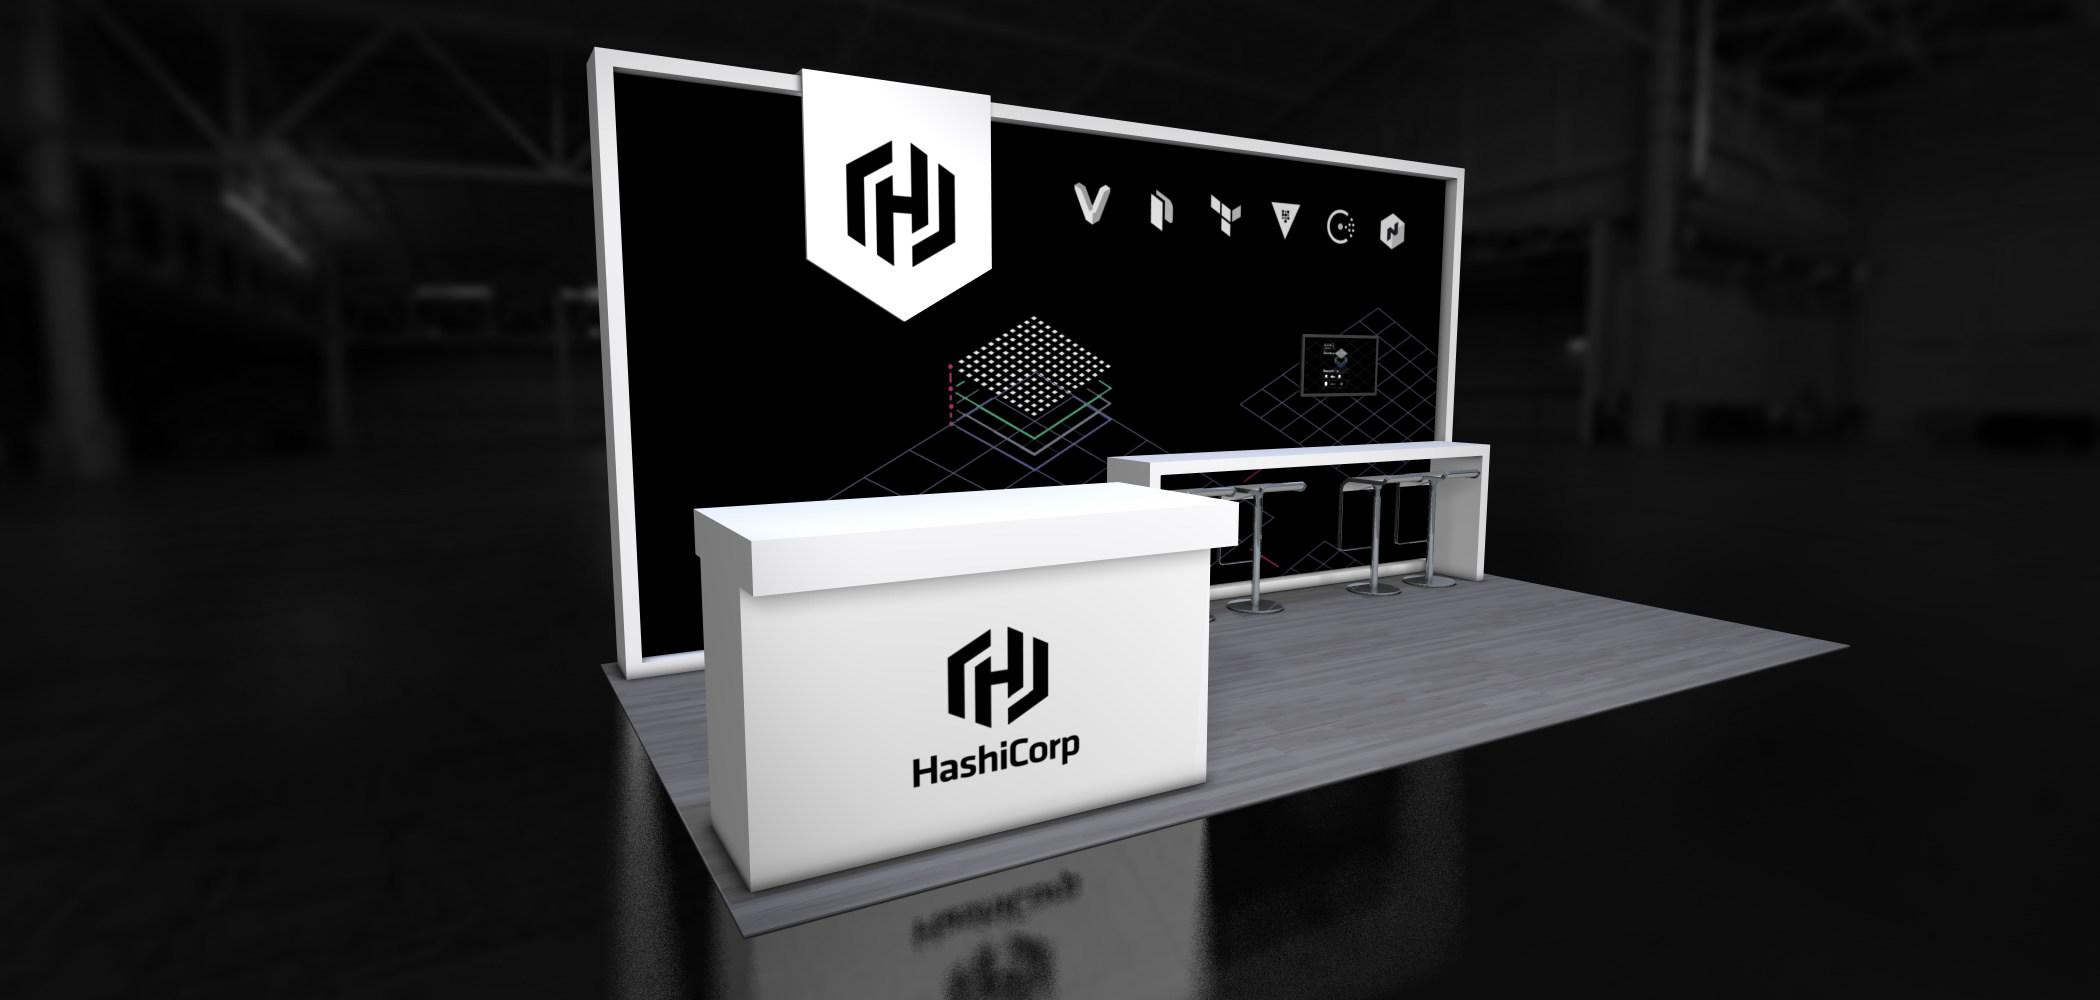 HashiCorp-AWSRI-2018-10x20-Concept3.2-FL